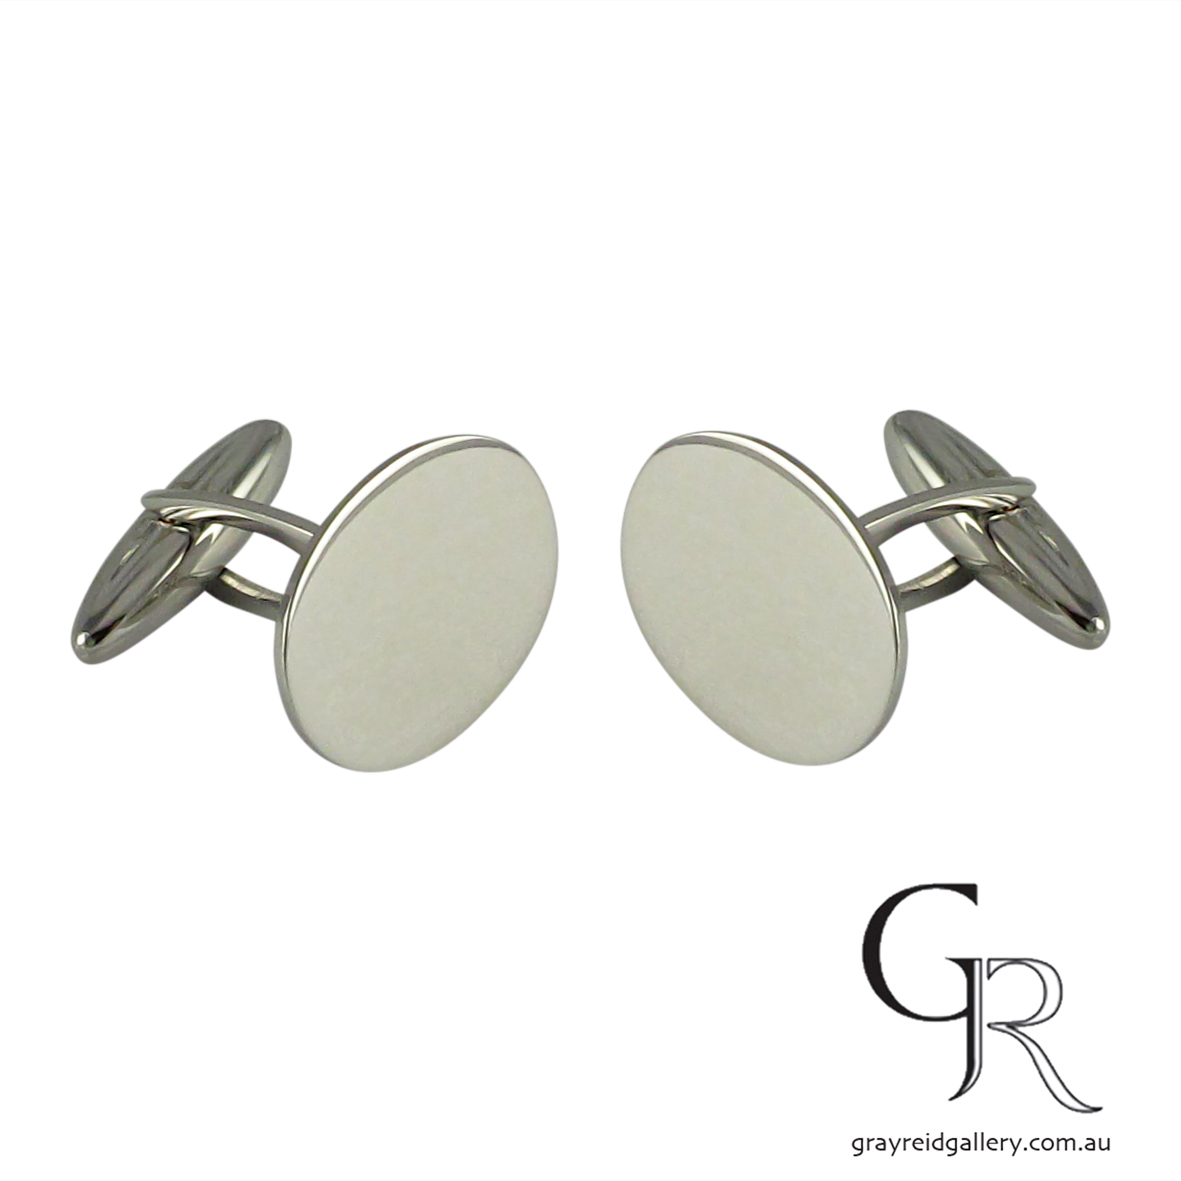 silver cufflinks plain.jpg